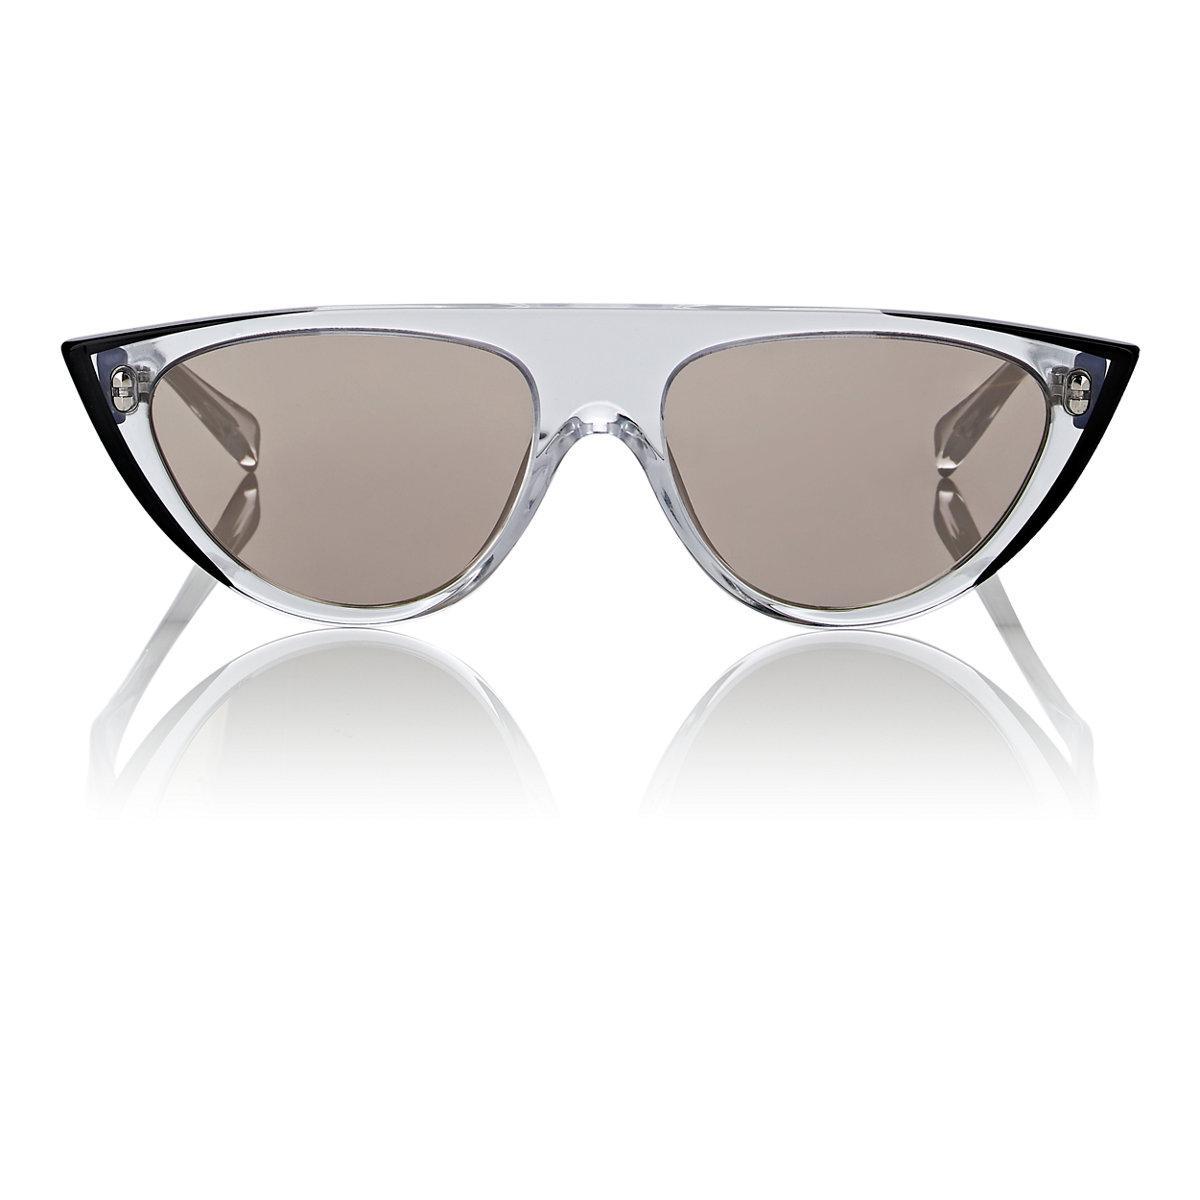 Womens Rayce Sunglasses Alain Mikli uHuSB